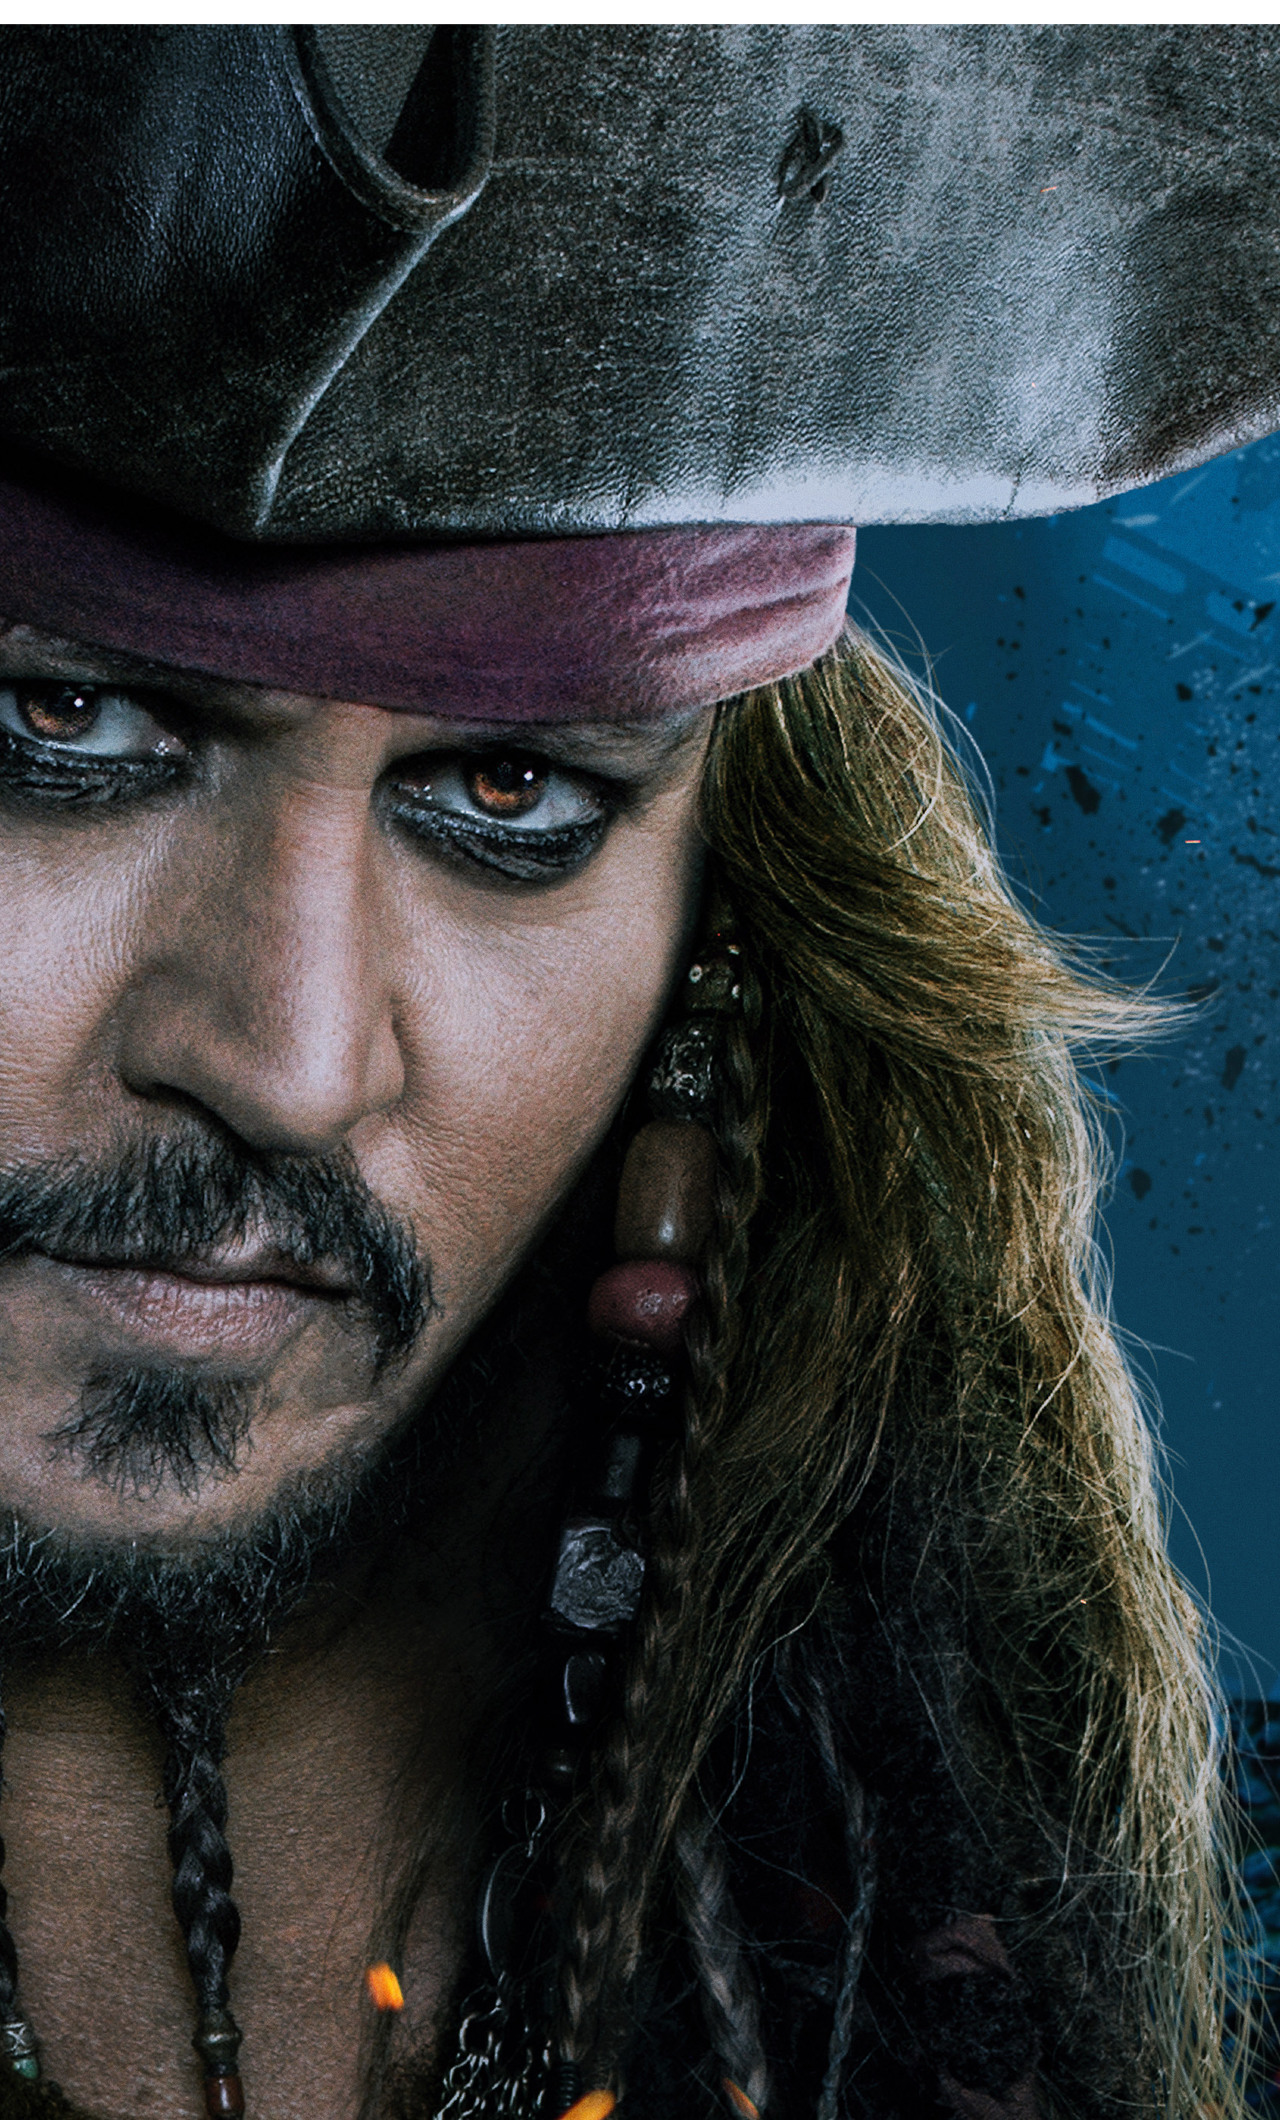 Jack Sparrow Pirates Of The Caribbean Dead Men Tell No Tales Still